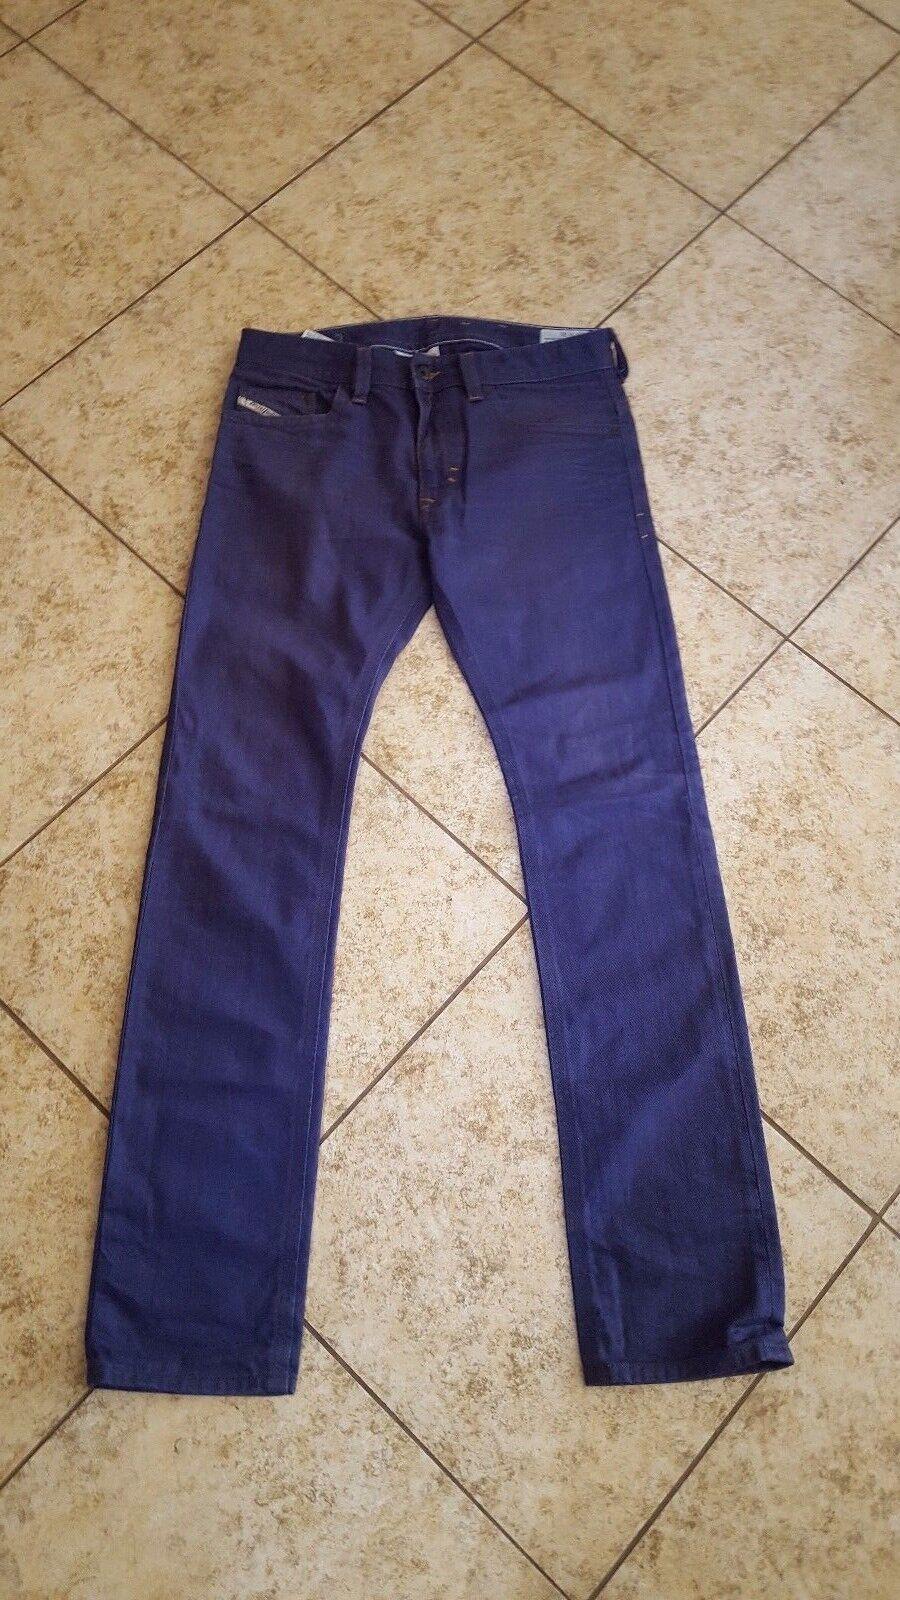 Diesel Men's Slim Skinny Jeans sz 31 Thavar 08QU Distressed Denim